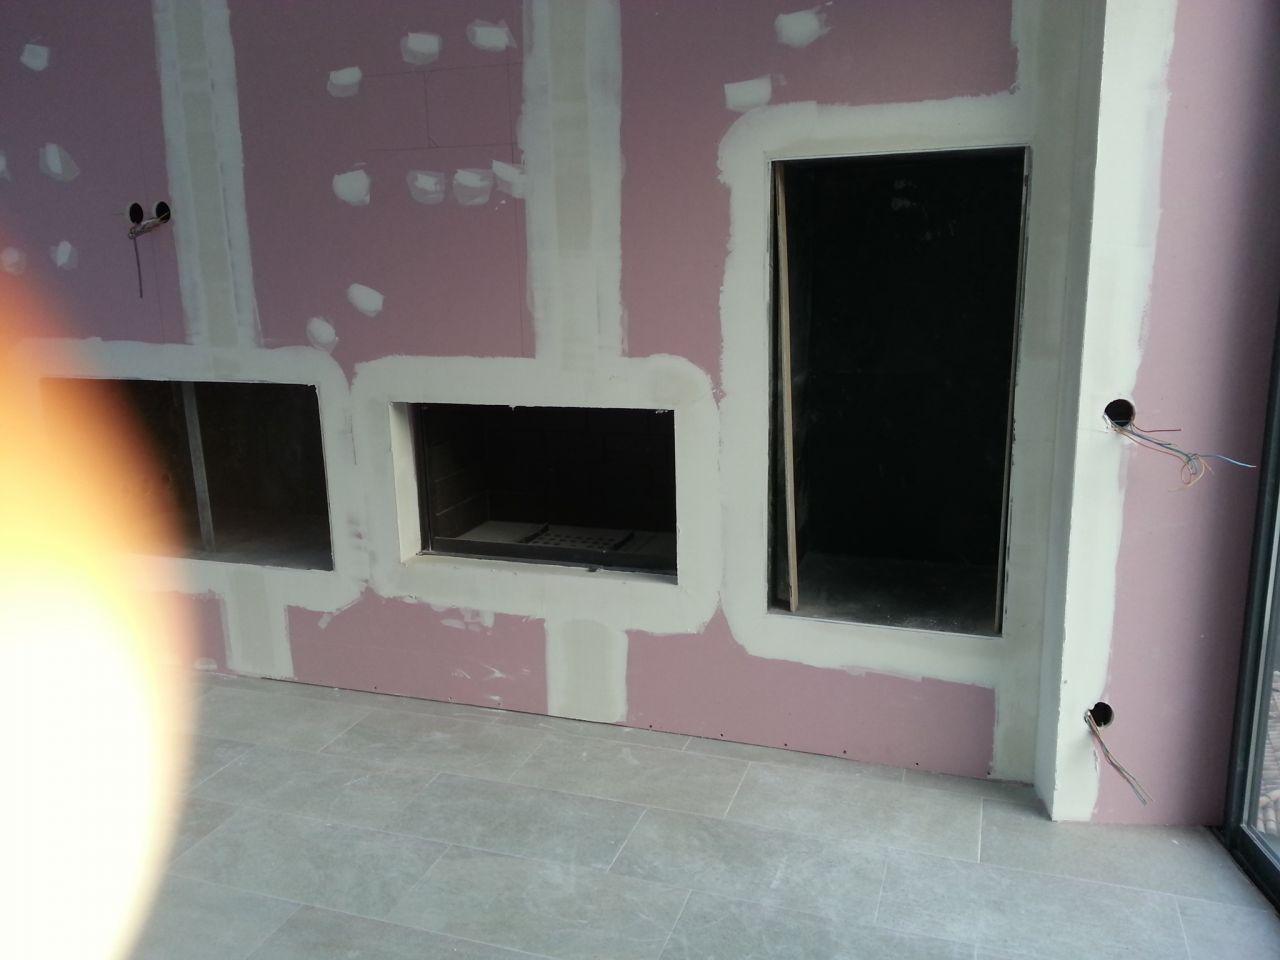 avis devis coffrage chemin e 9 messages. Black Bedroom Furniture Sets. Home Design Ideas